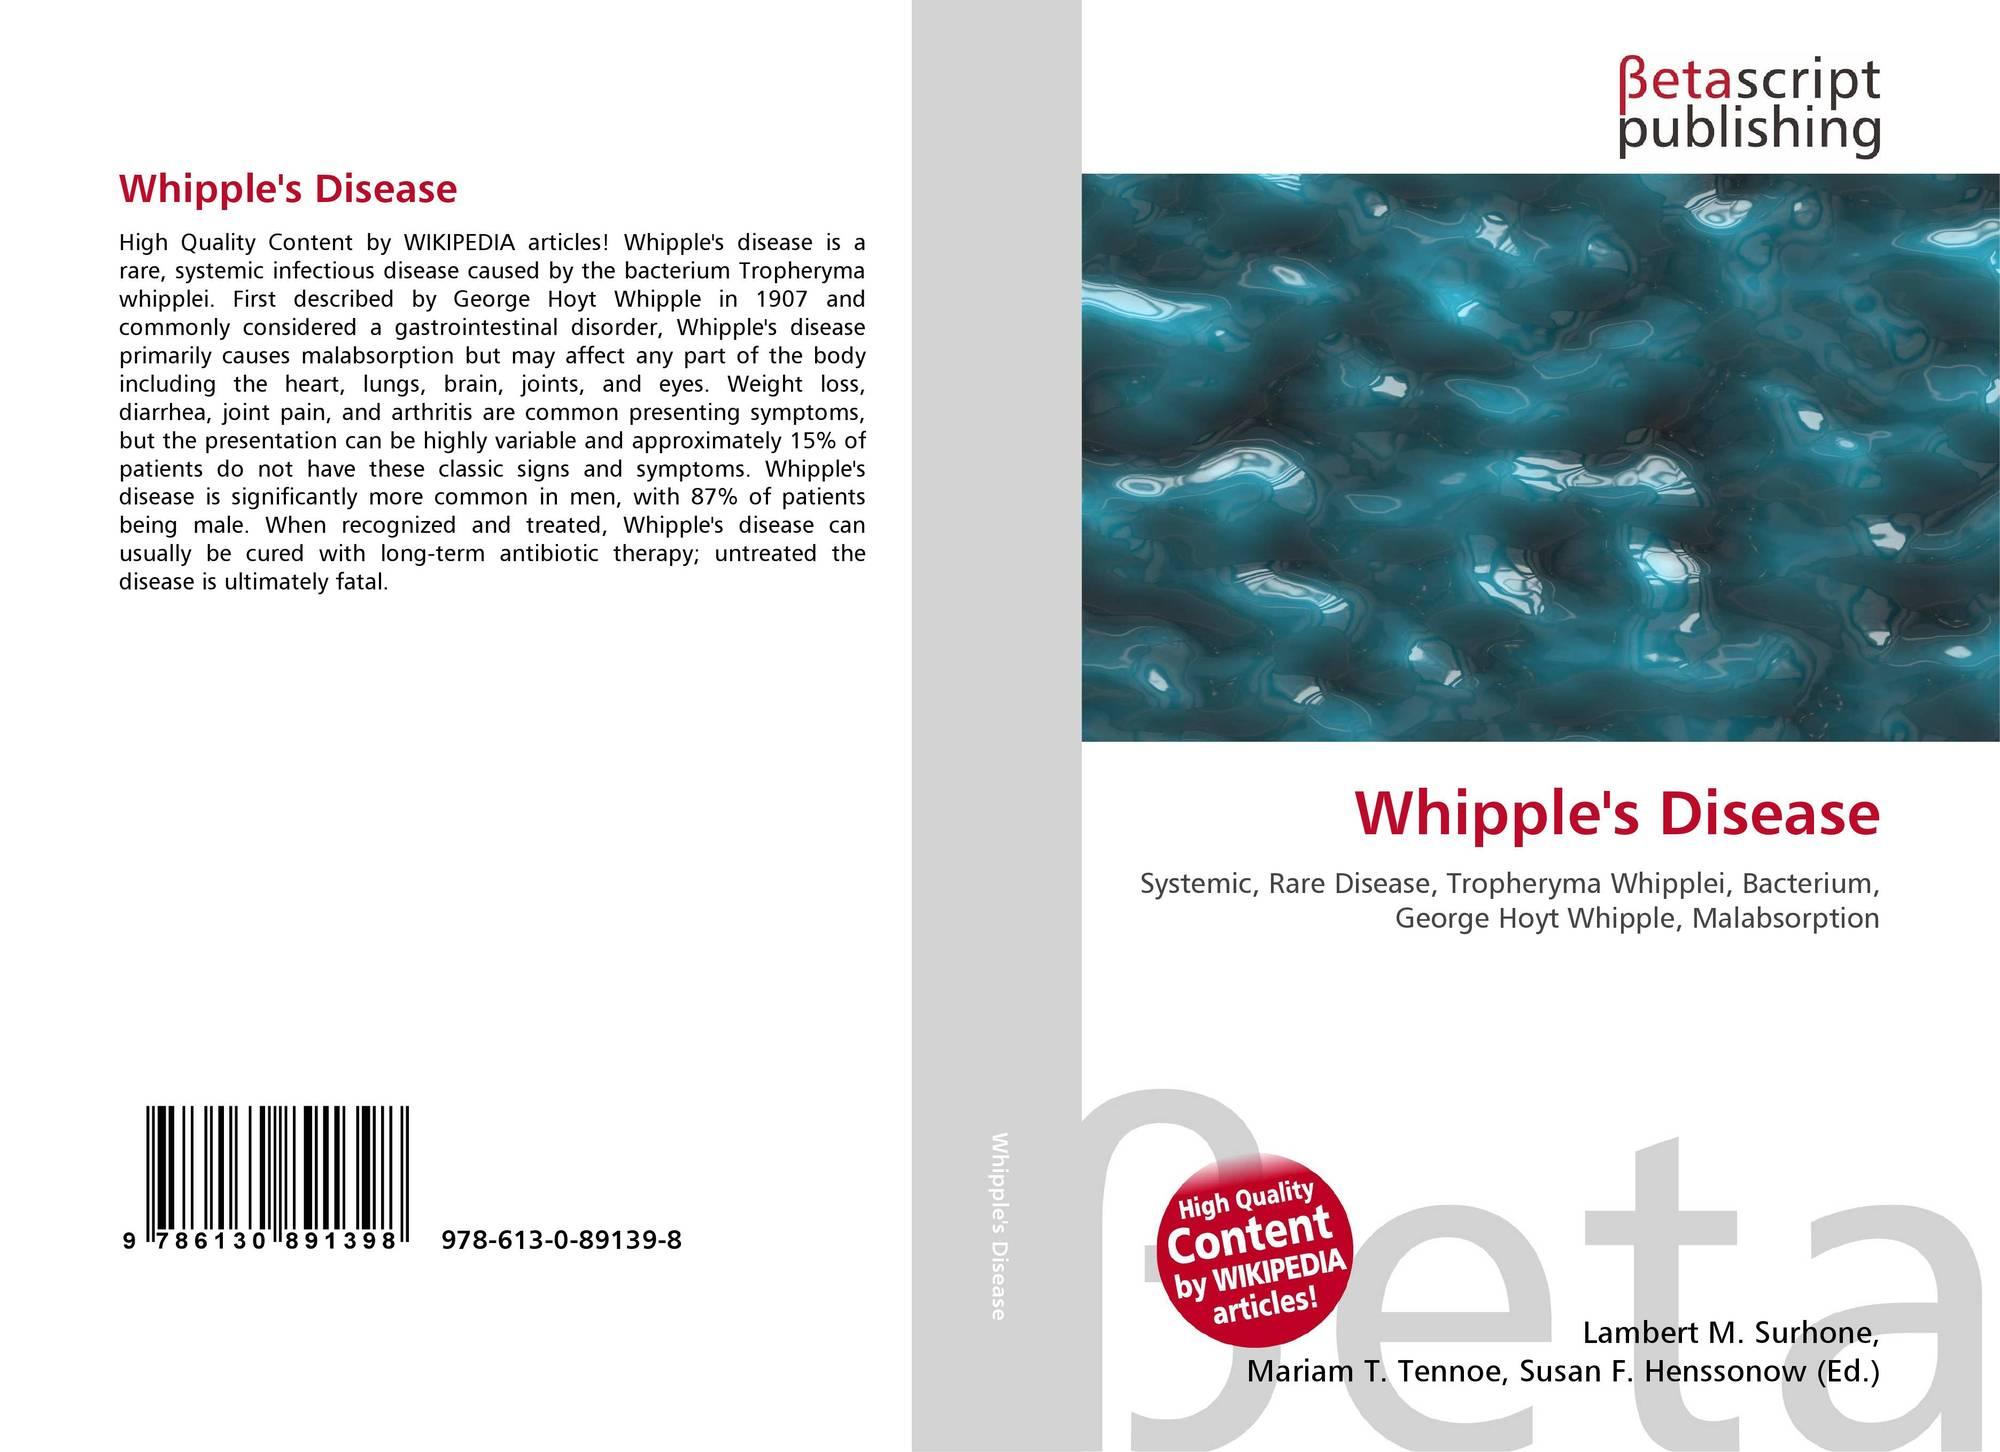 Whipple's Disease, 15 15 15 15 15, 1515153 ,1515151515에 대한 갤러리